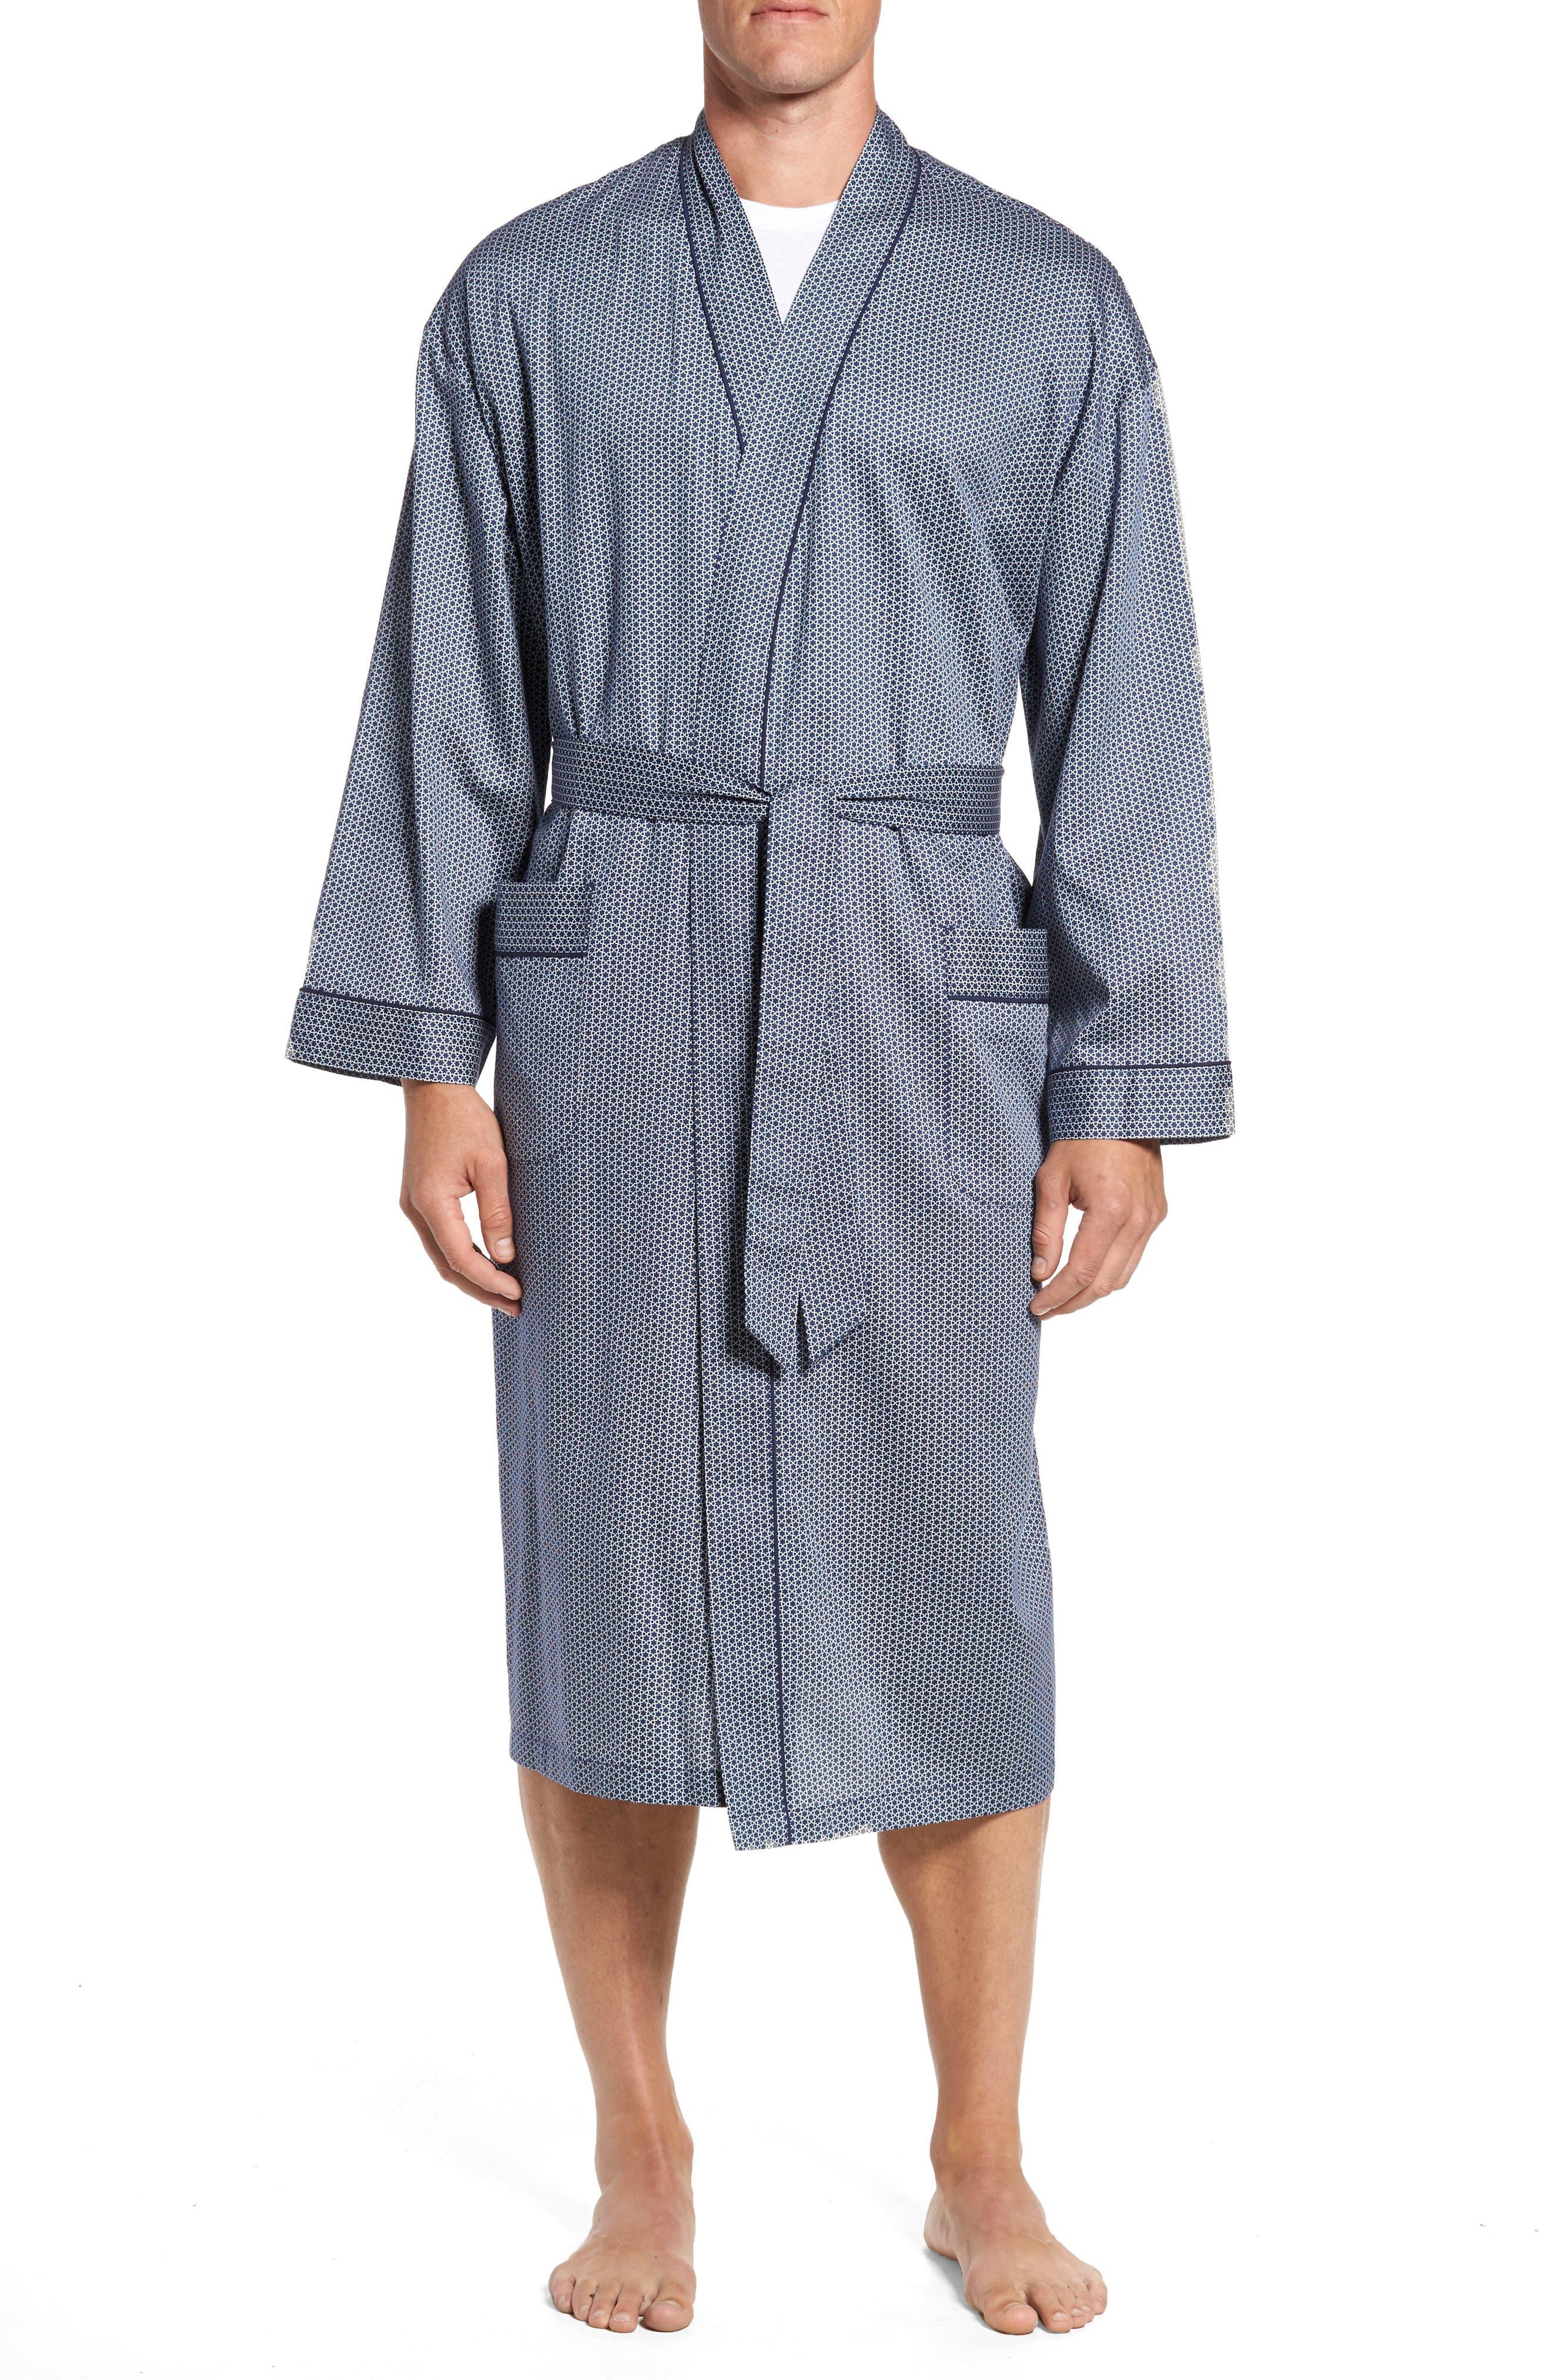 Winterlude Robe,                             Main thumbnail 1, color,                             402